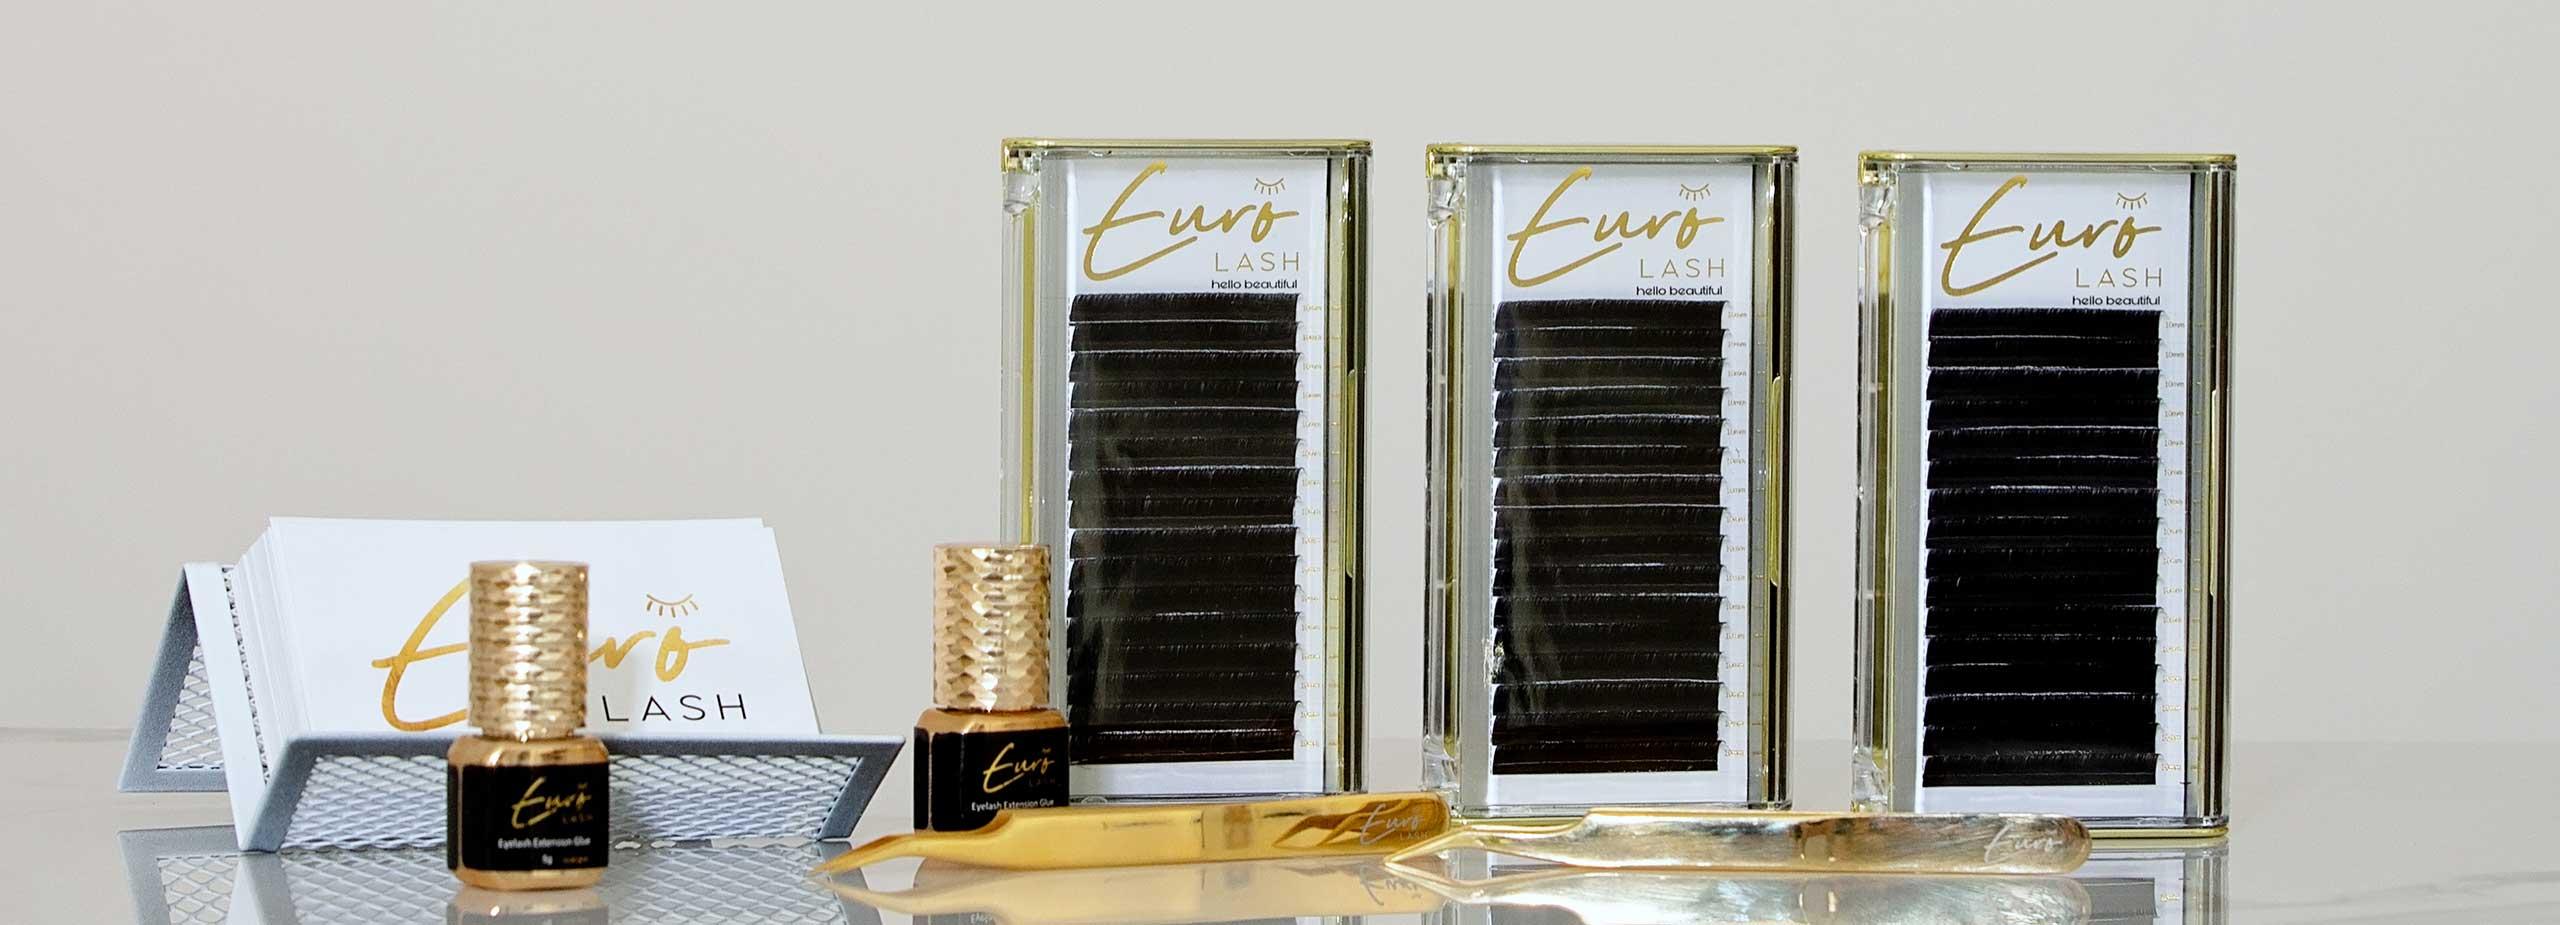 Eurolash Produkter